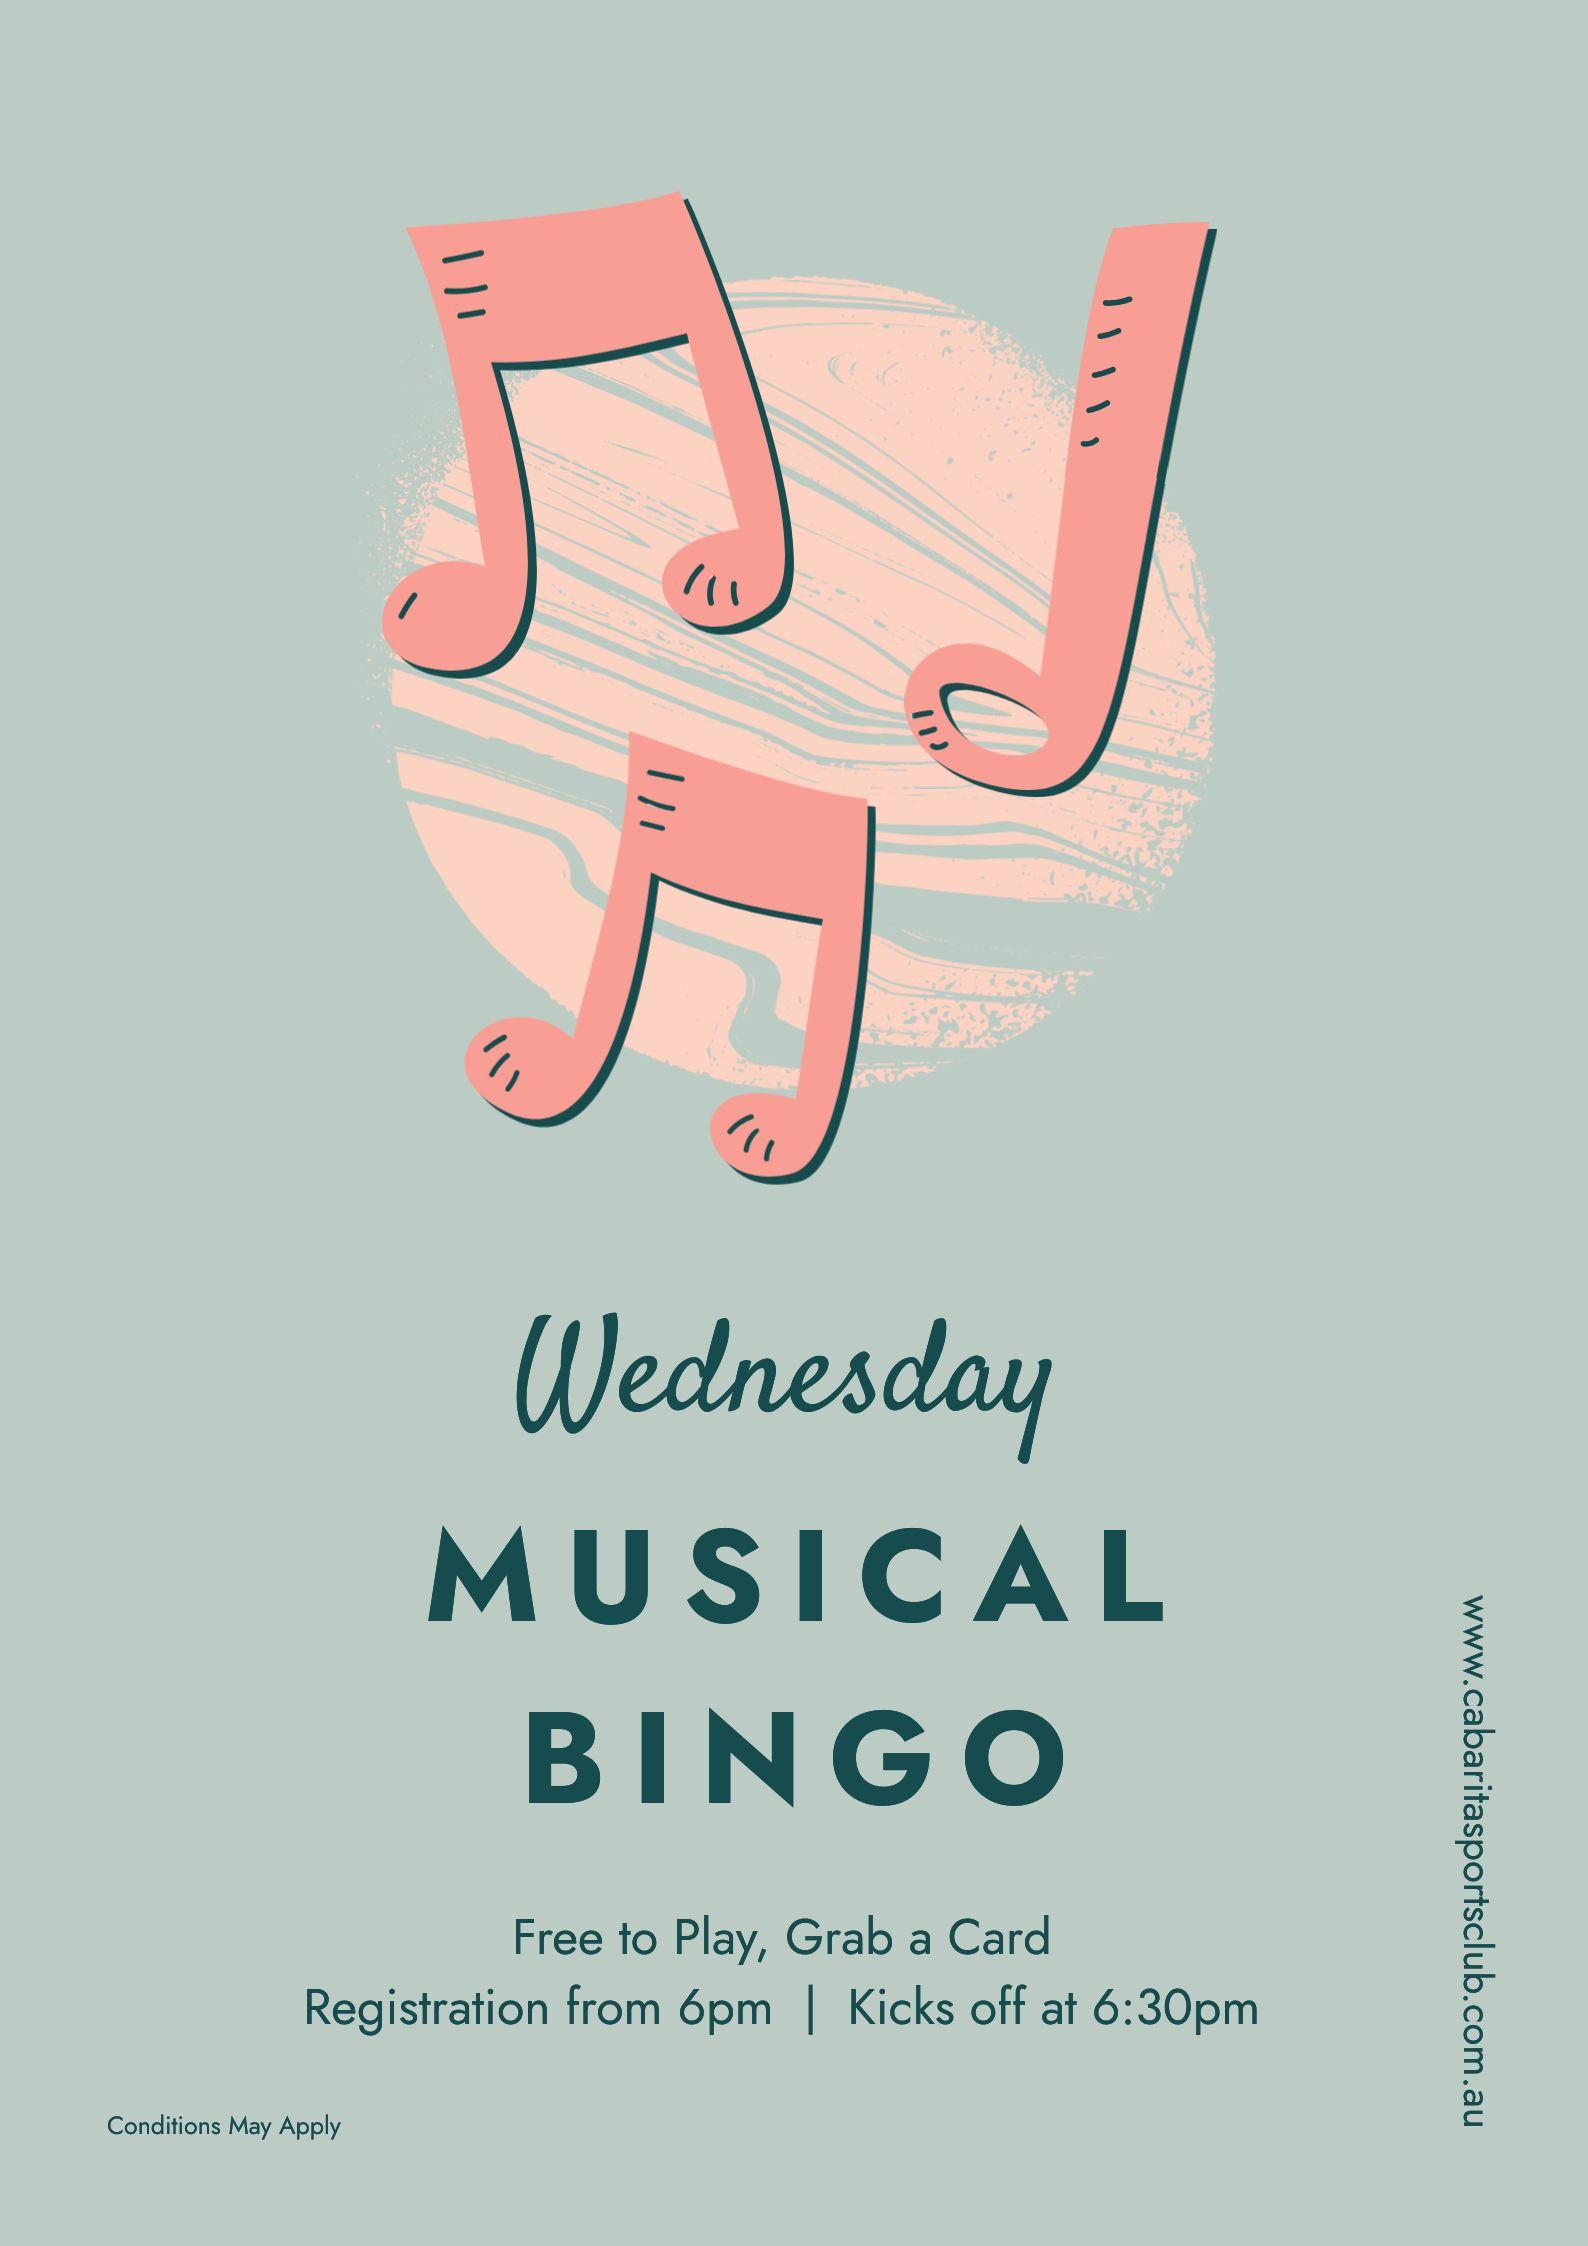 cbbsc musical bingo poster 1